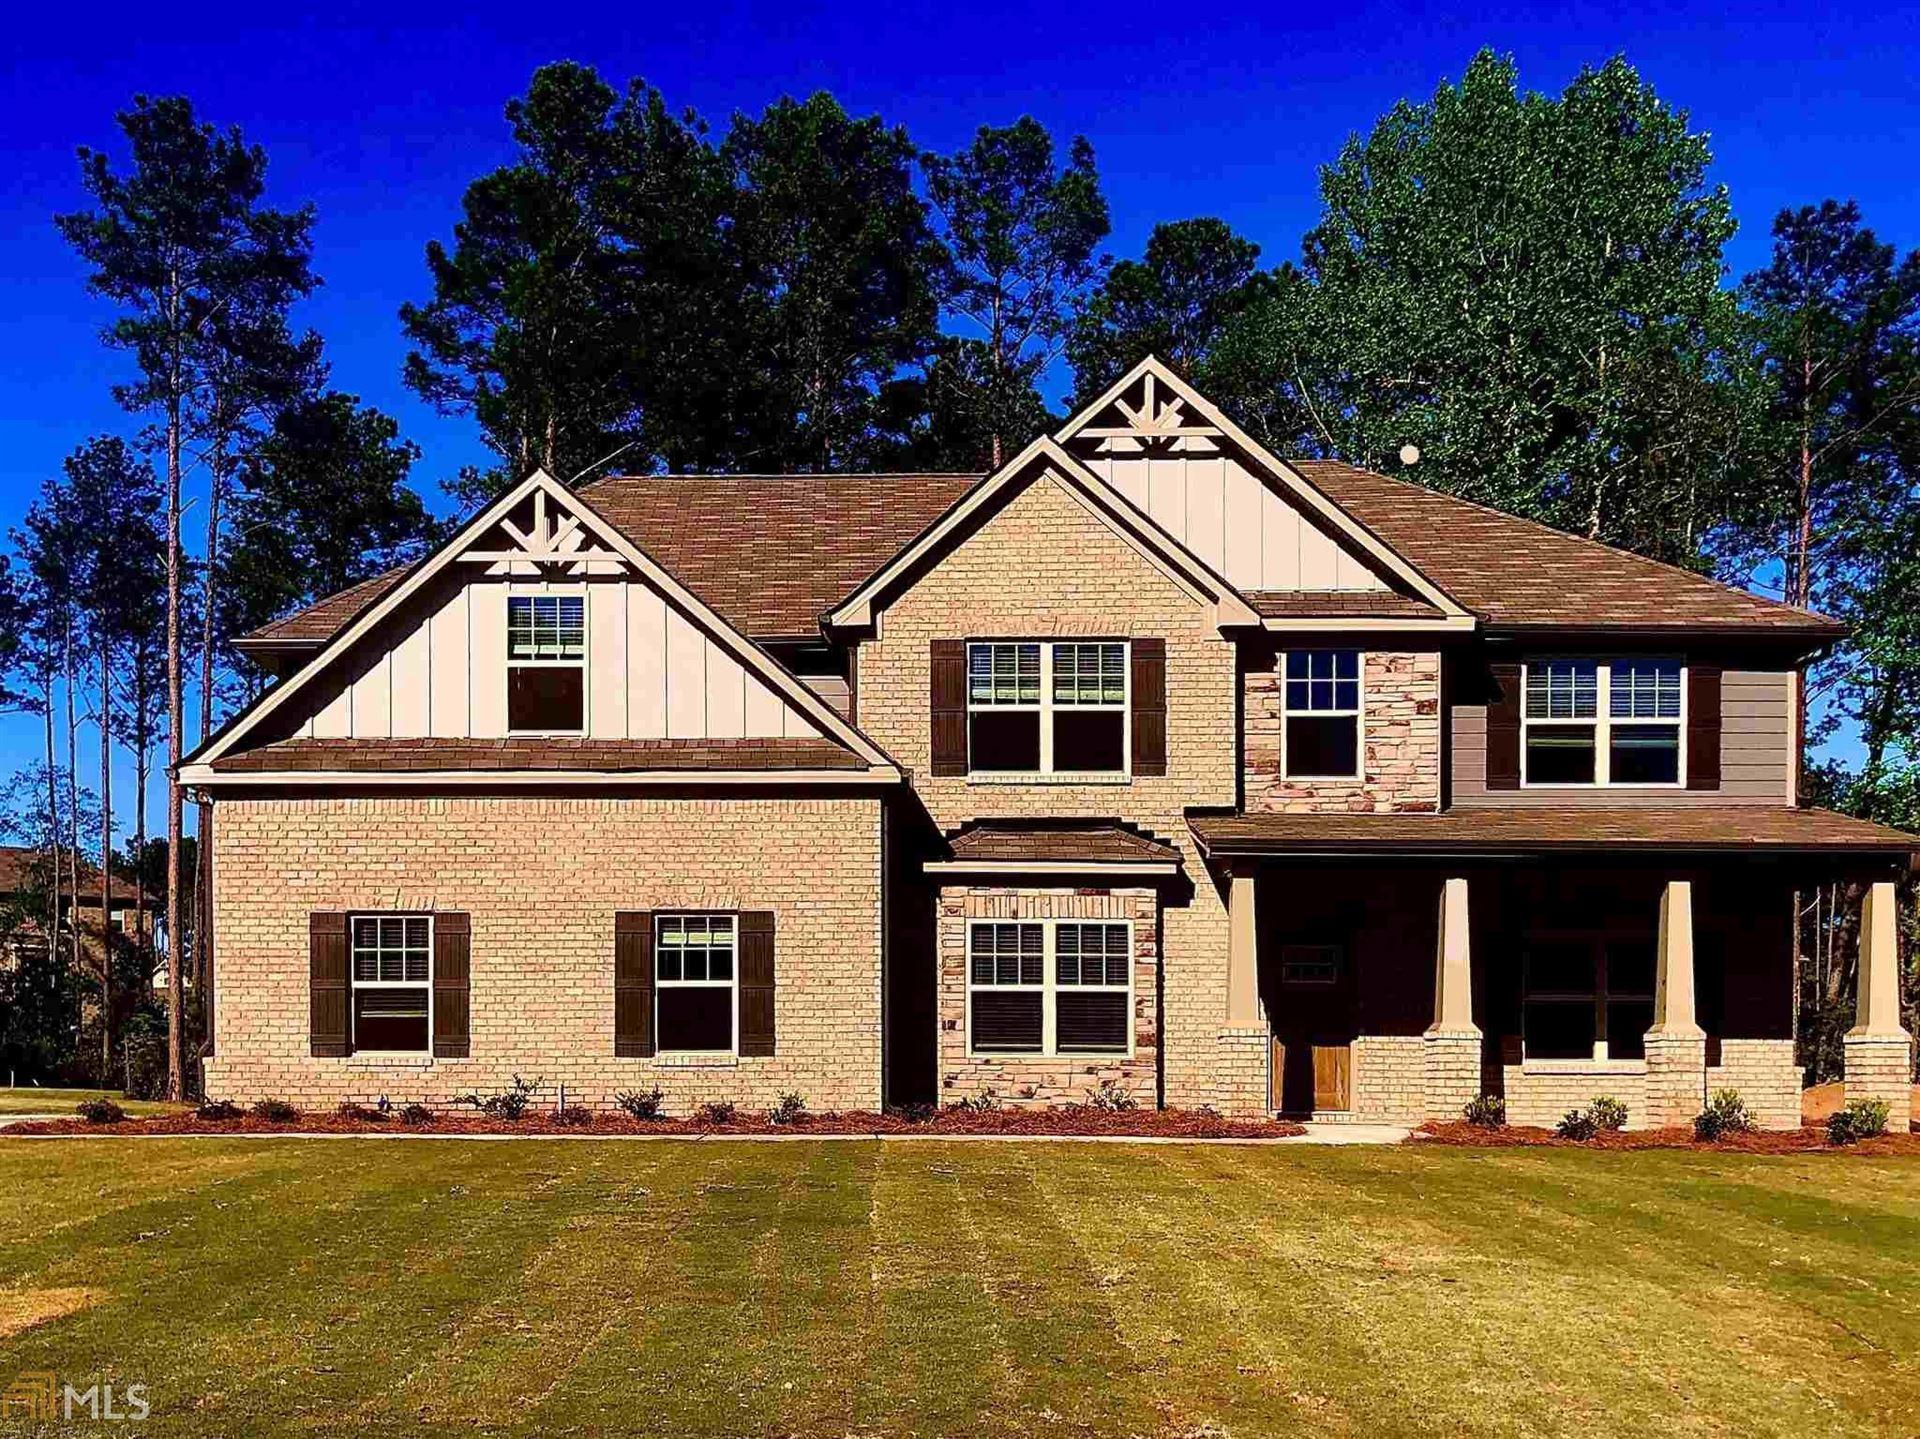 604 Laceleaf Ln, McDonough, GA 30252 - MLS#: 8876786